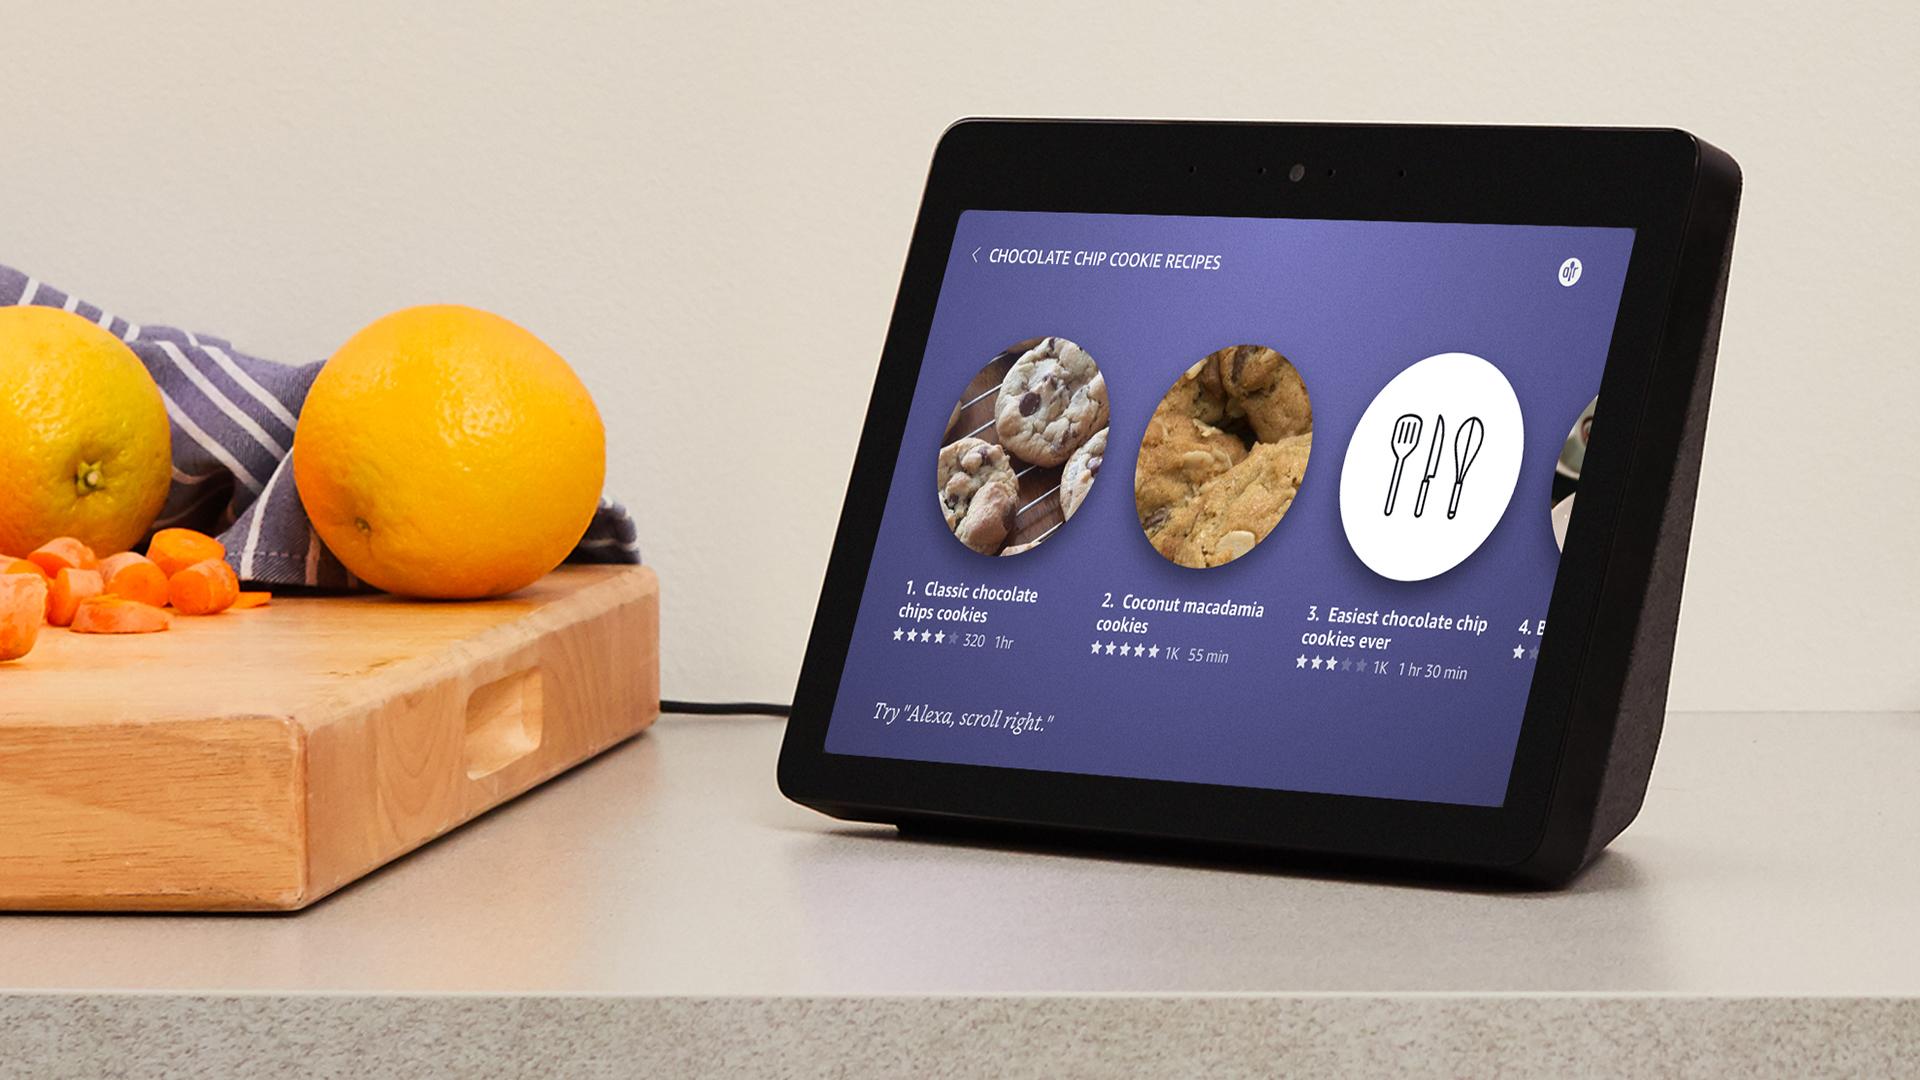 Top 10 Smart Home Gadgets 2019 - Amazon Echo (DigitaleWelt)